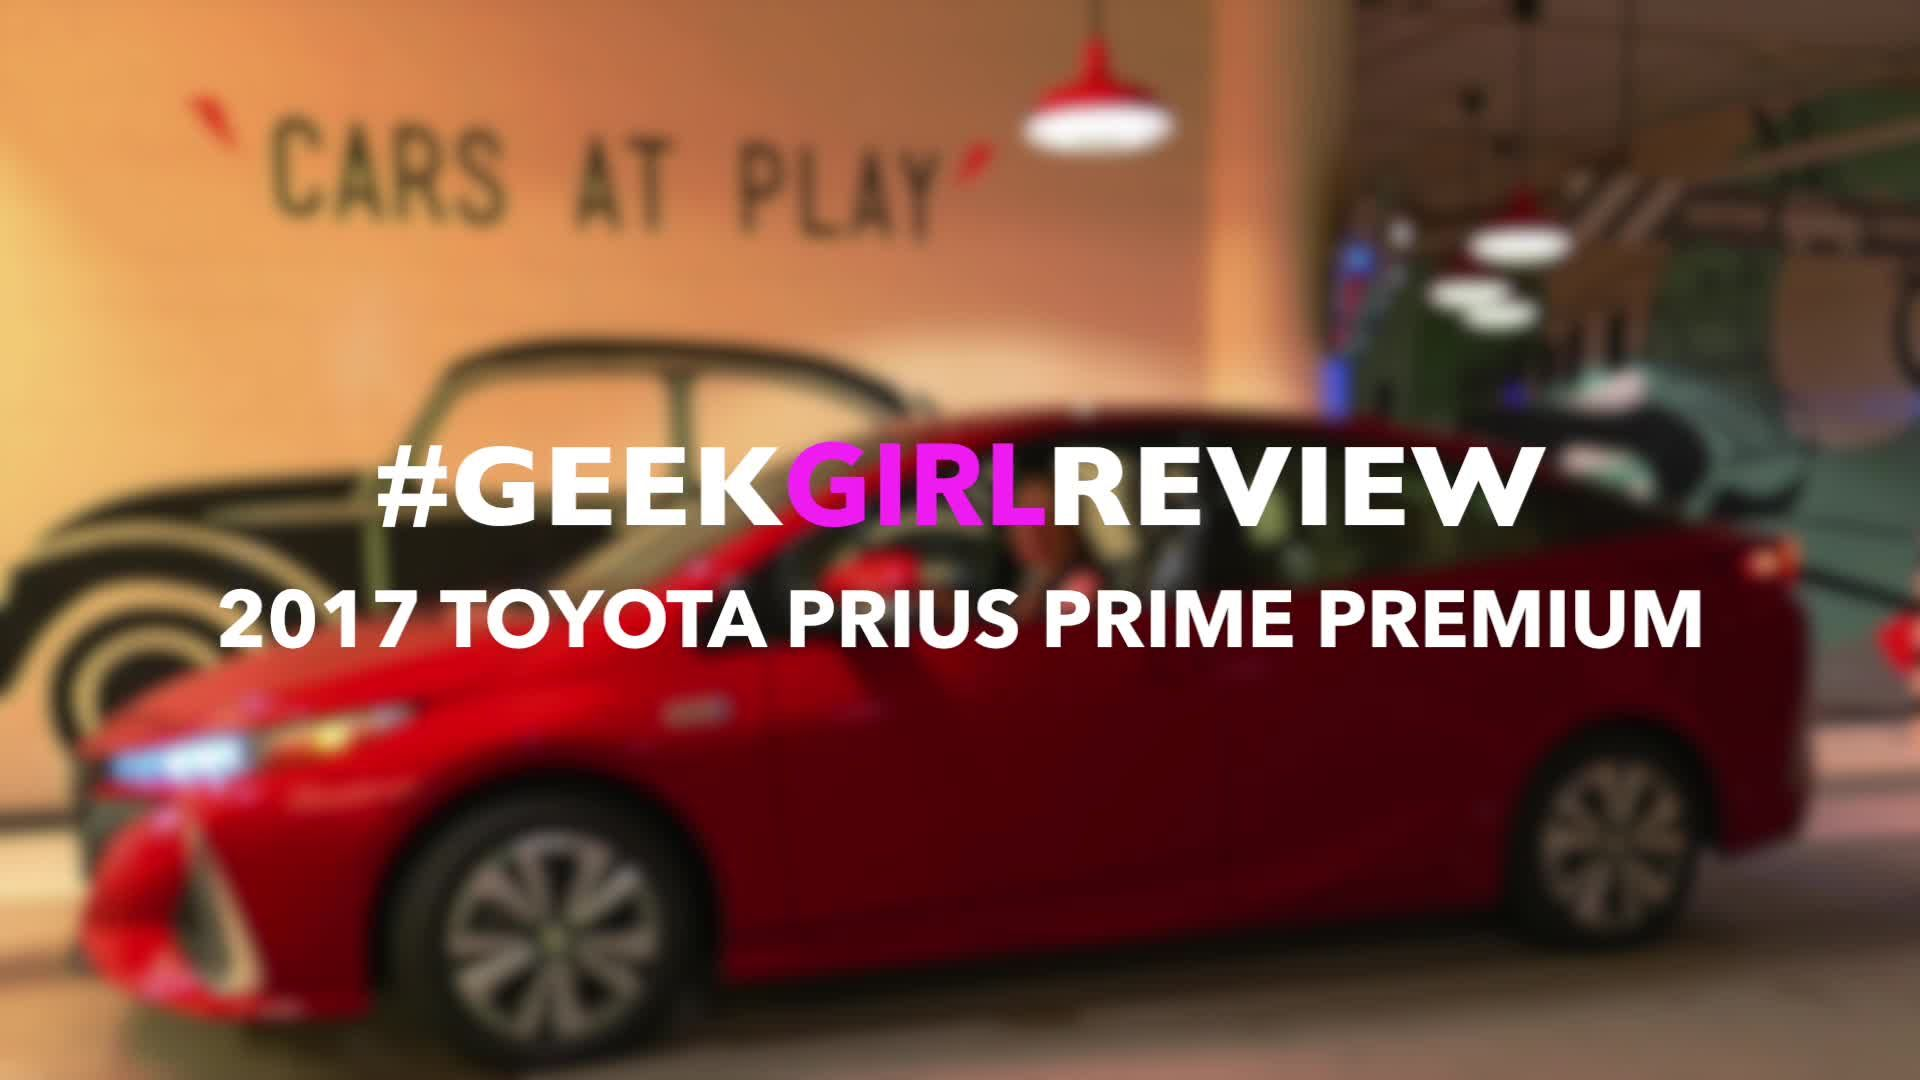 Tales of Emma: 2017 Toyota Prius Prime Premium Geek Girl Review